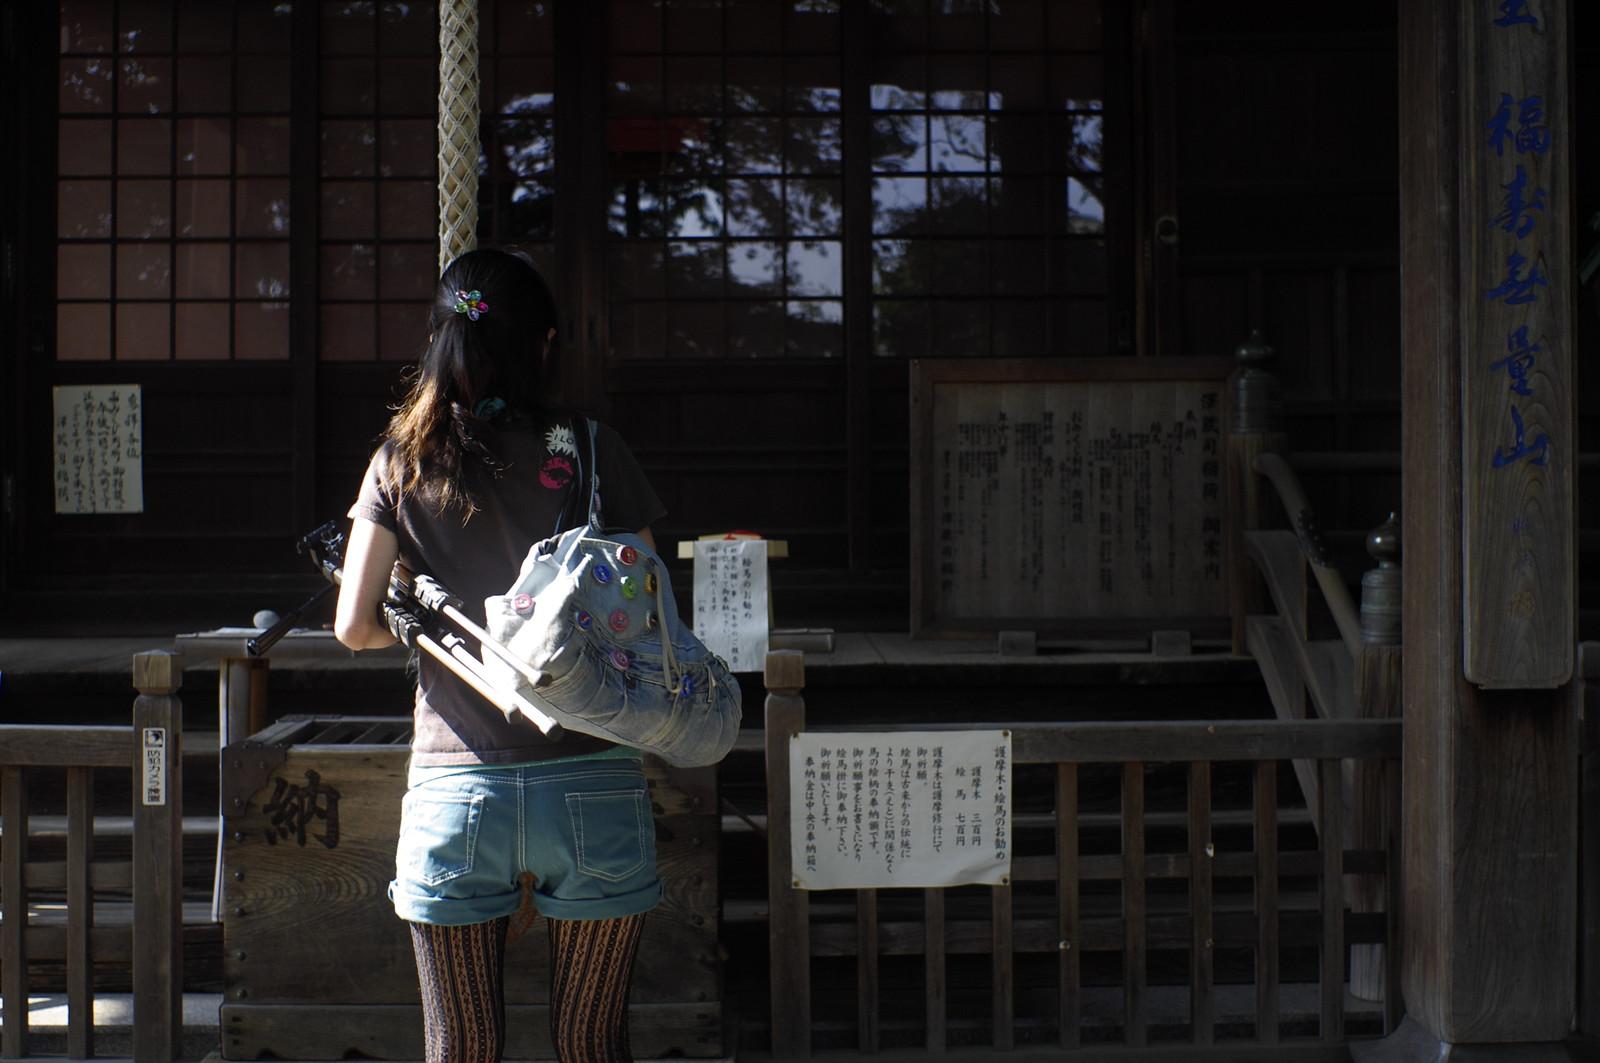 2012_07_27 15_32_04